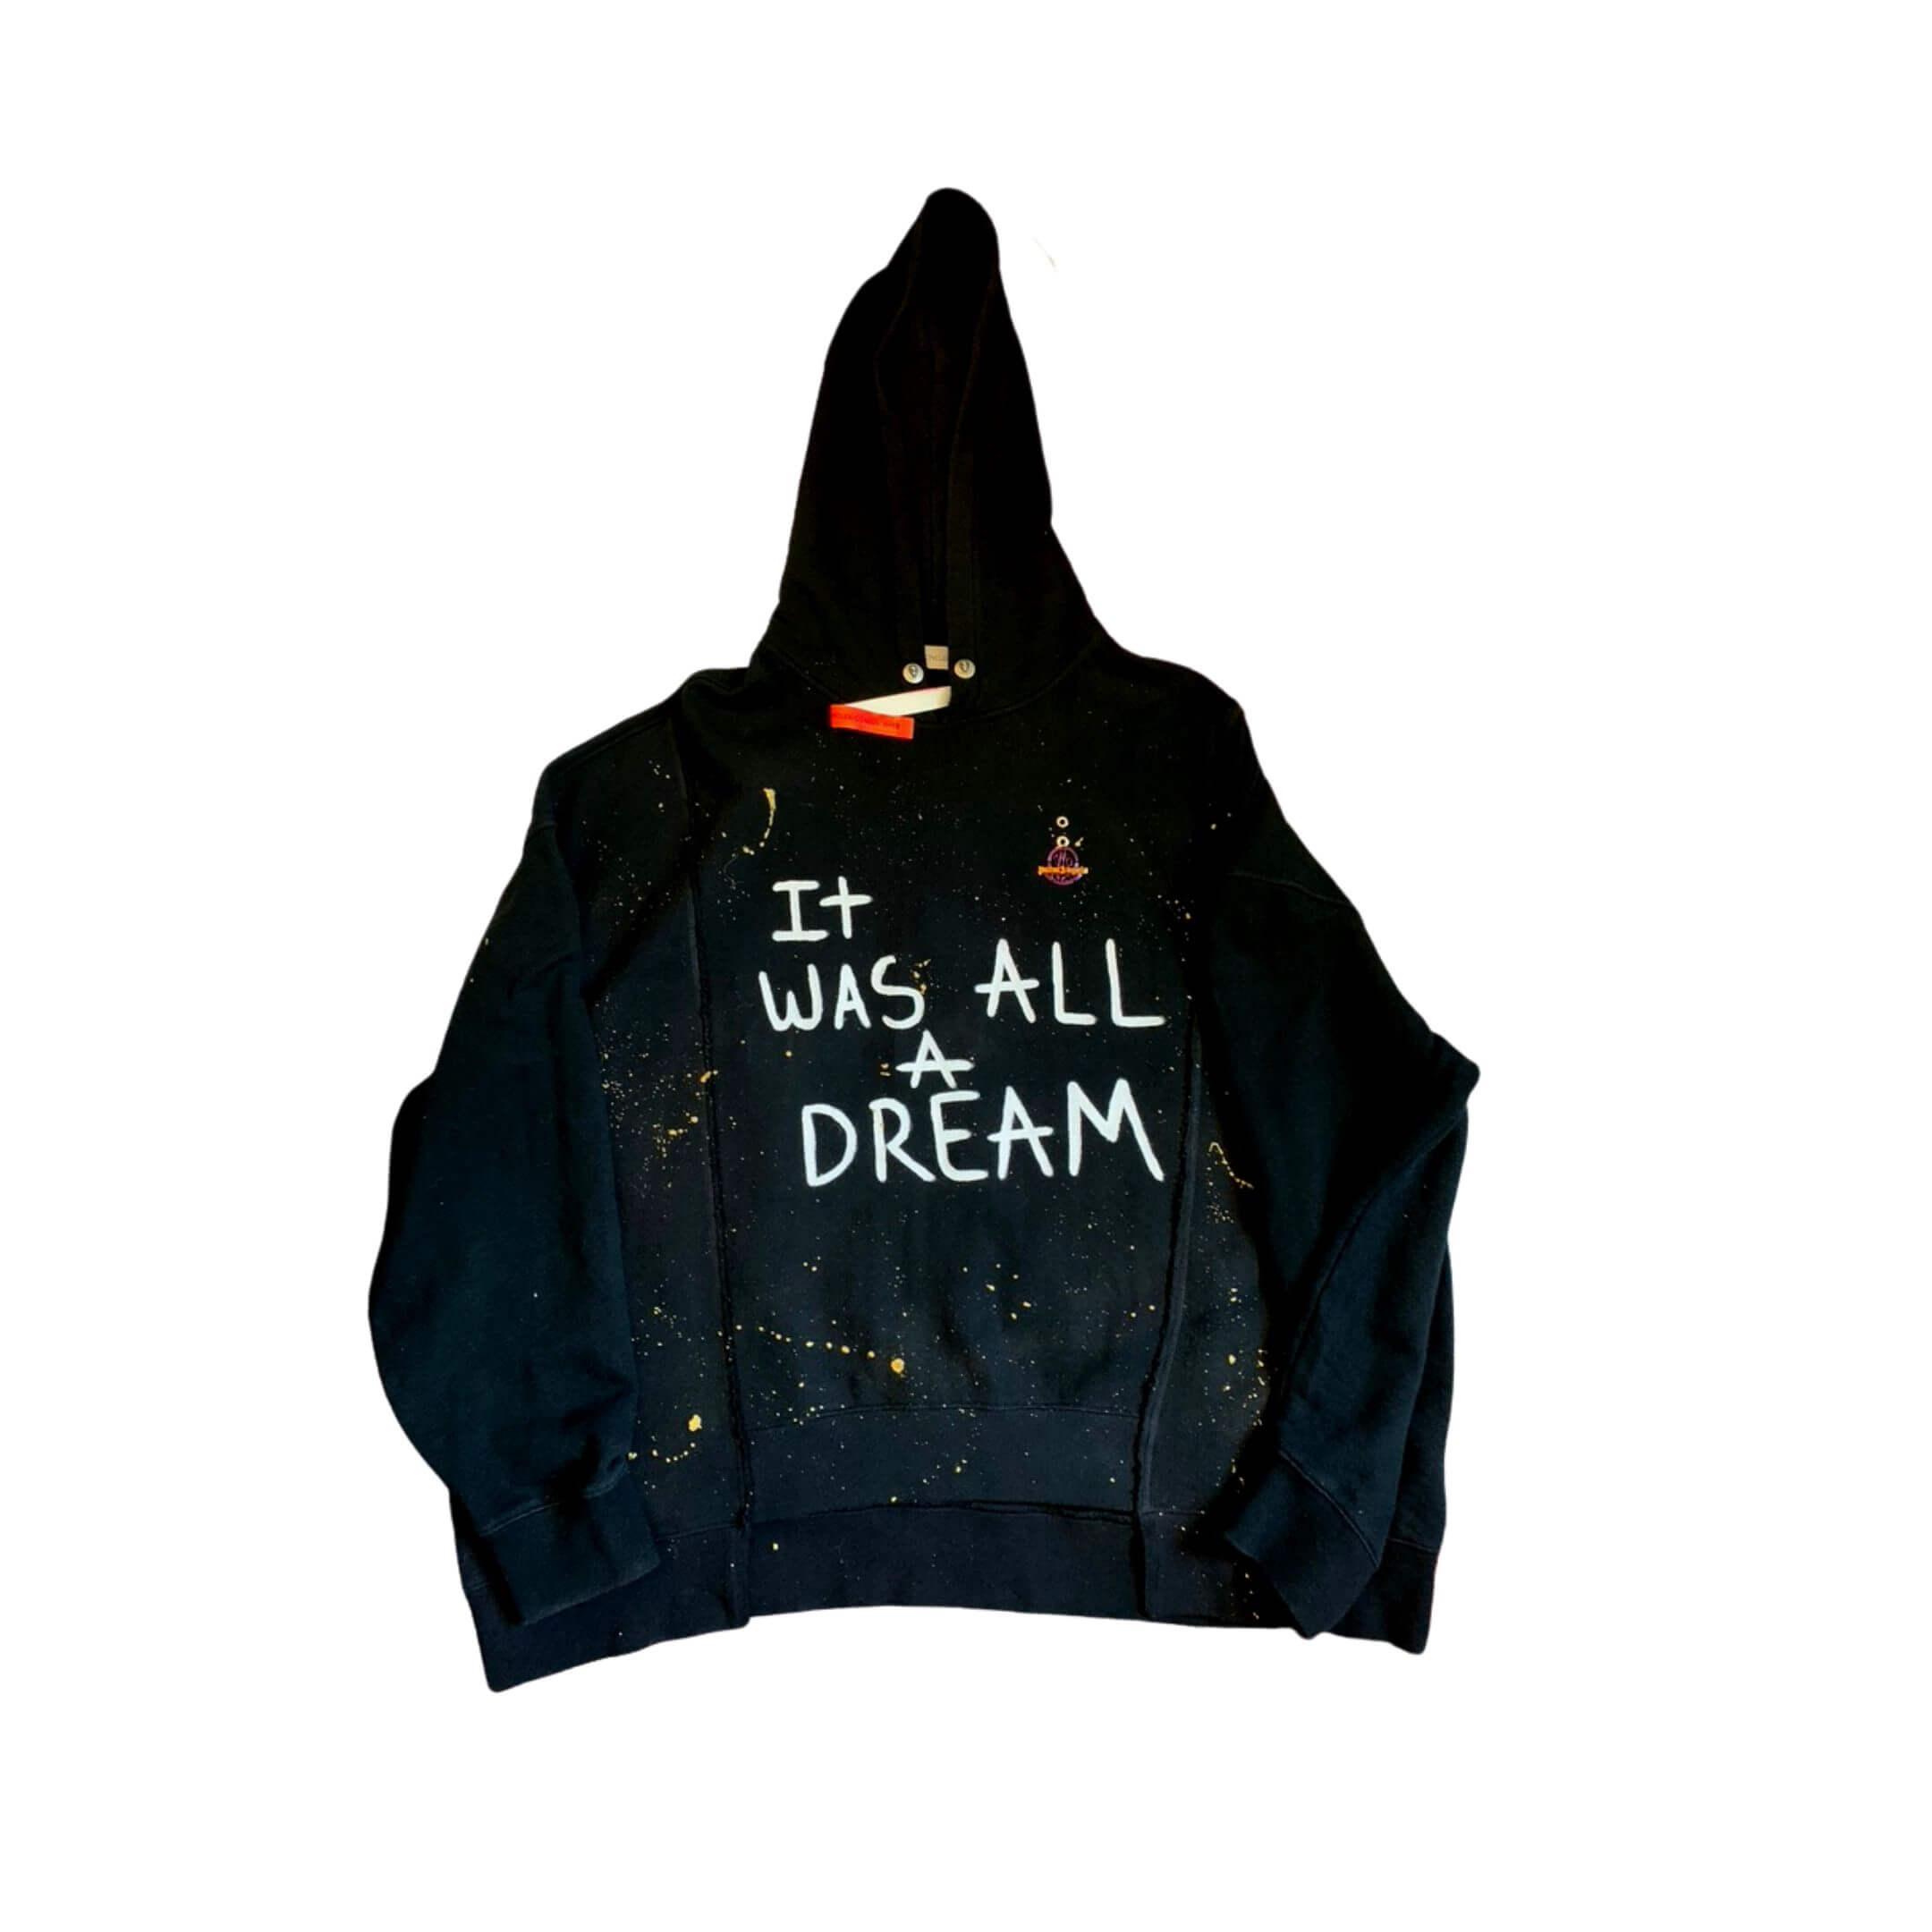 It Was All A Dream by Adieny Nuñez